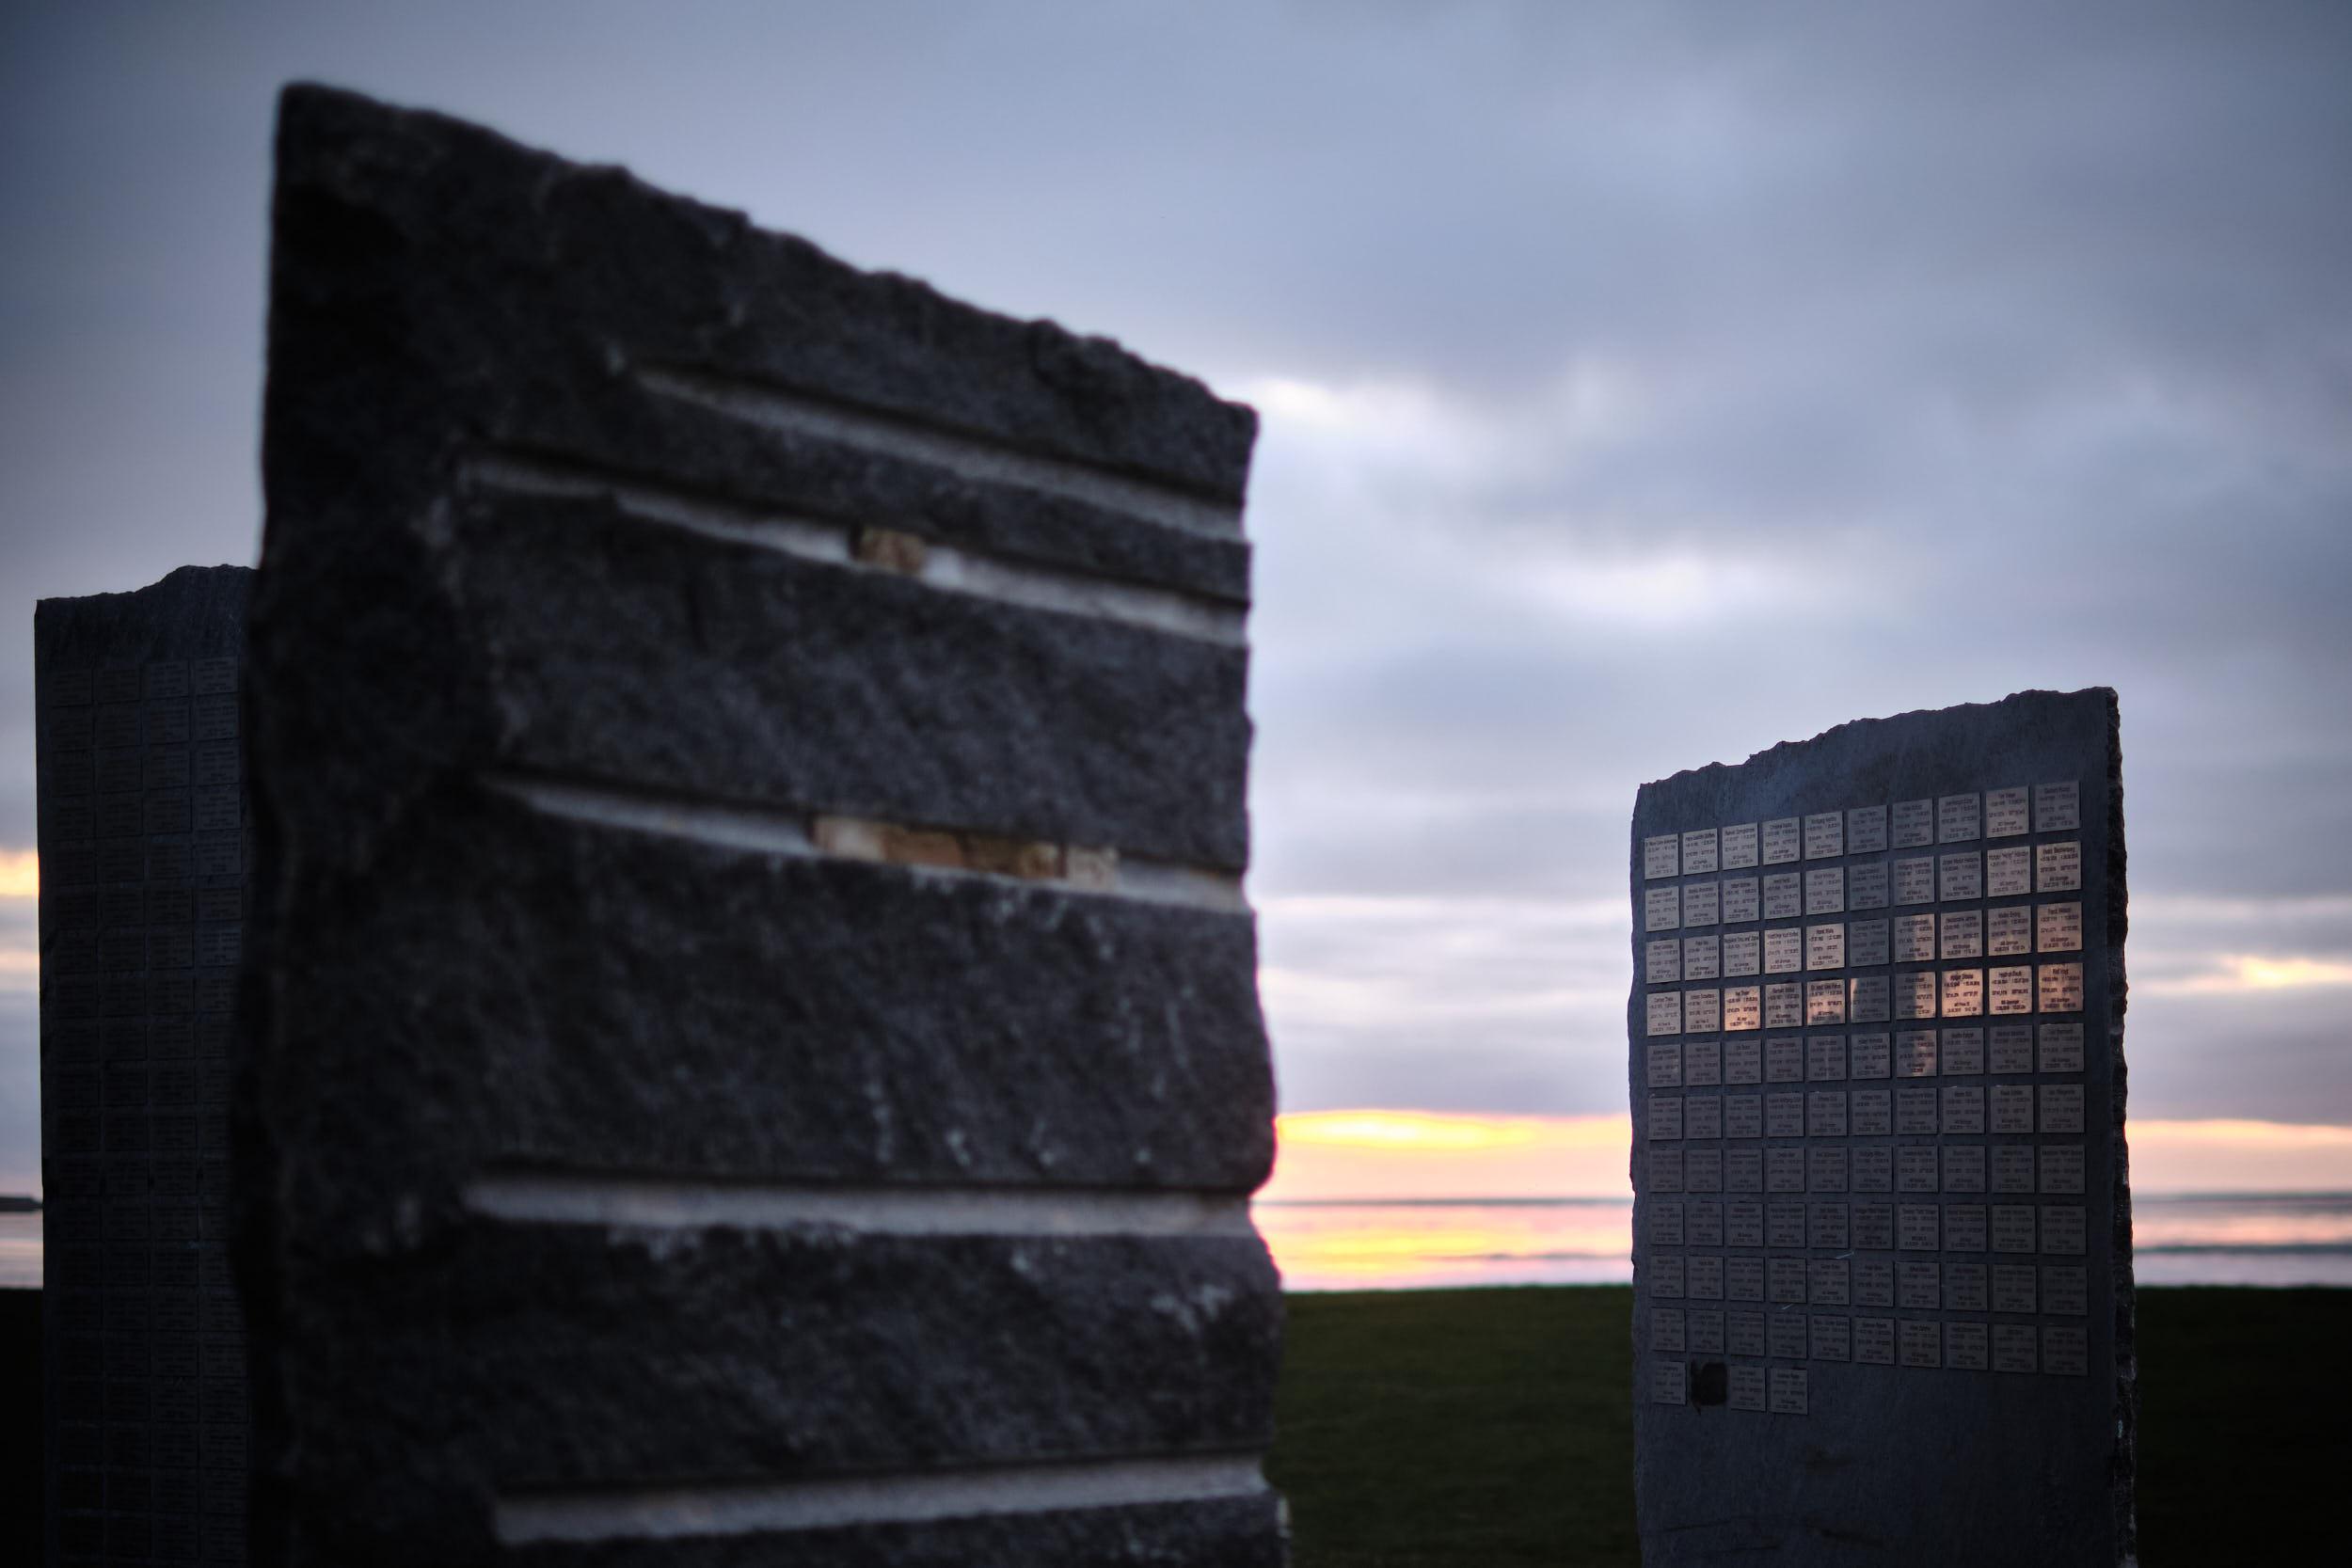 Gedenkstätte Meeresblick Seebestattungen Norddeich Mole Plaketten